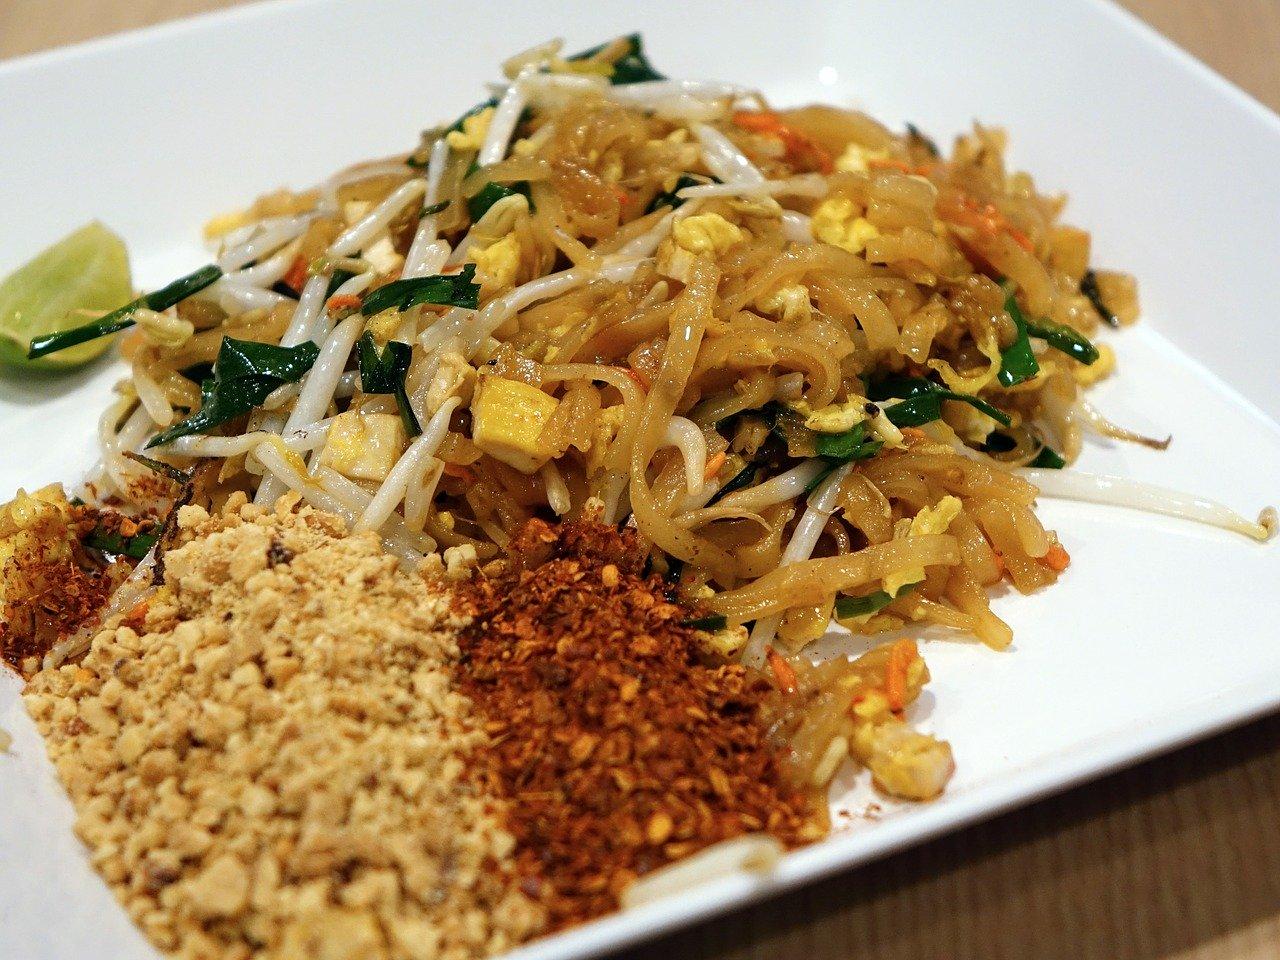 food favourites, favorite food, international cuisine, international cooking, Thailand, Pad Thai